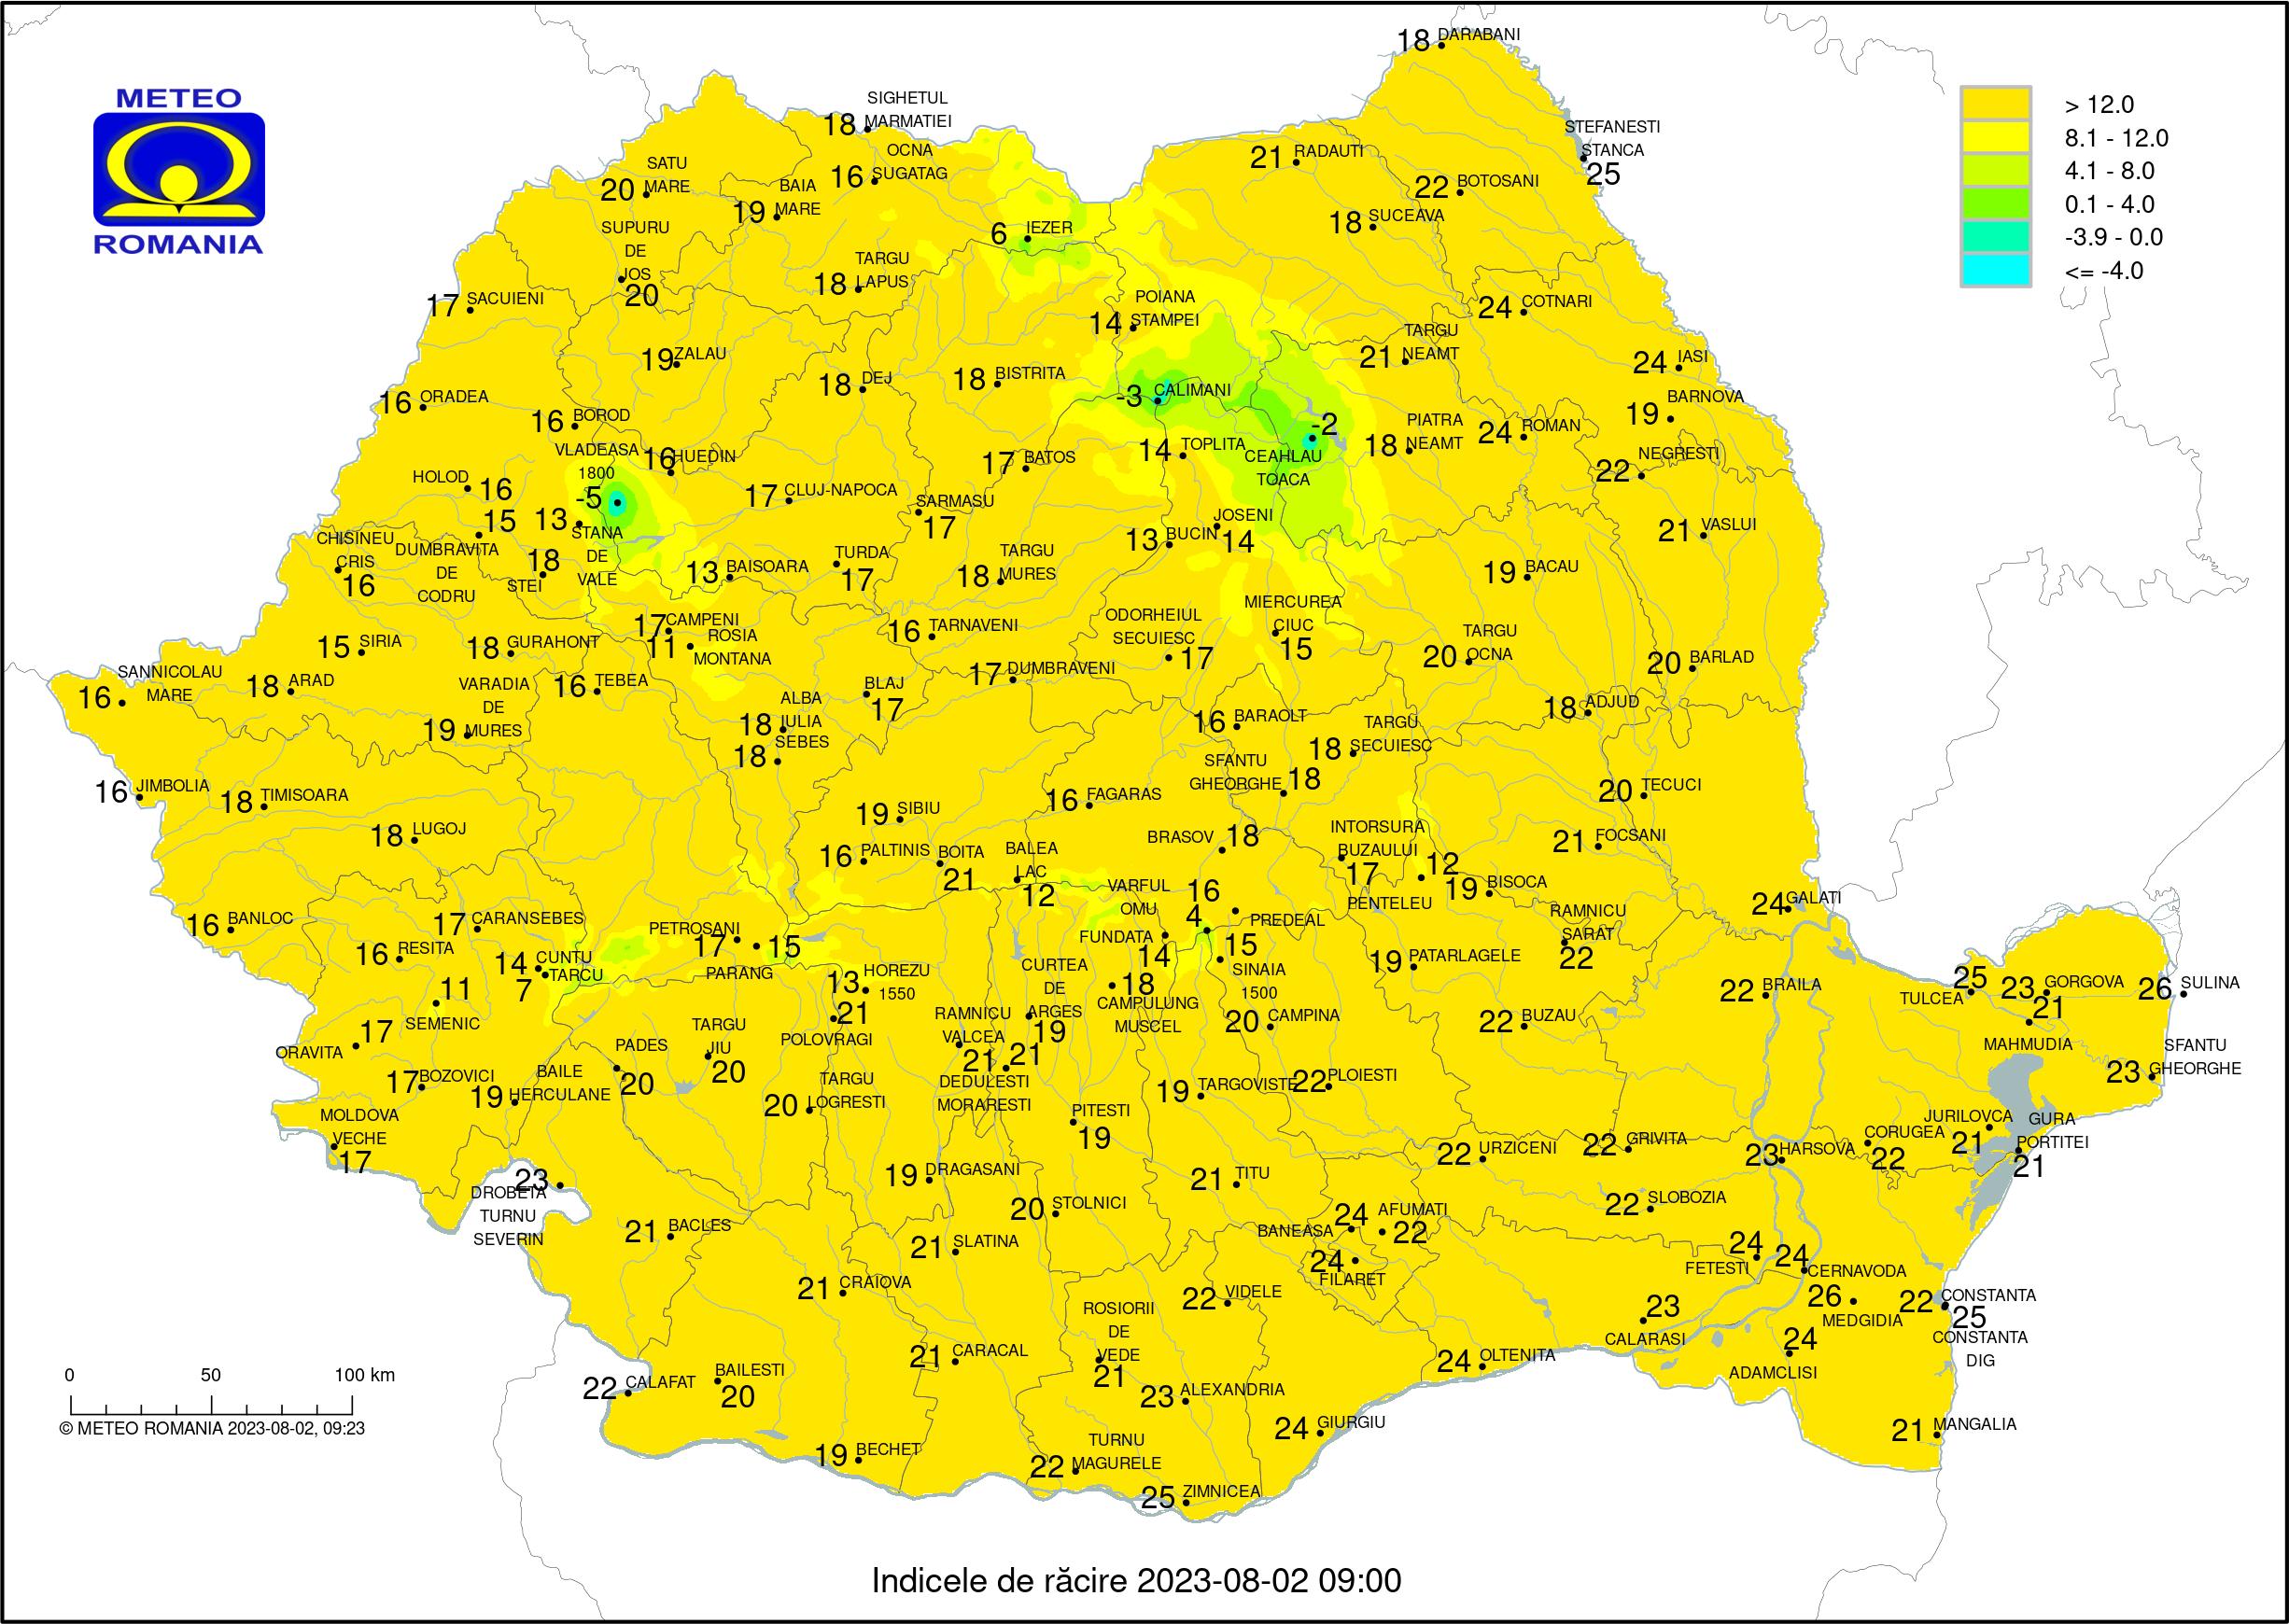 Temperaturi Inregistrate Acum. Minime si Maxime ale zilei inregistrate in Romania